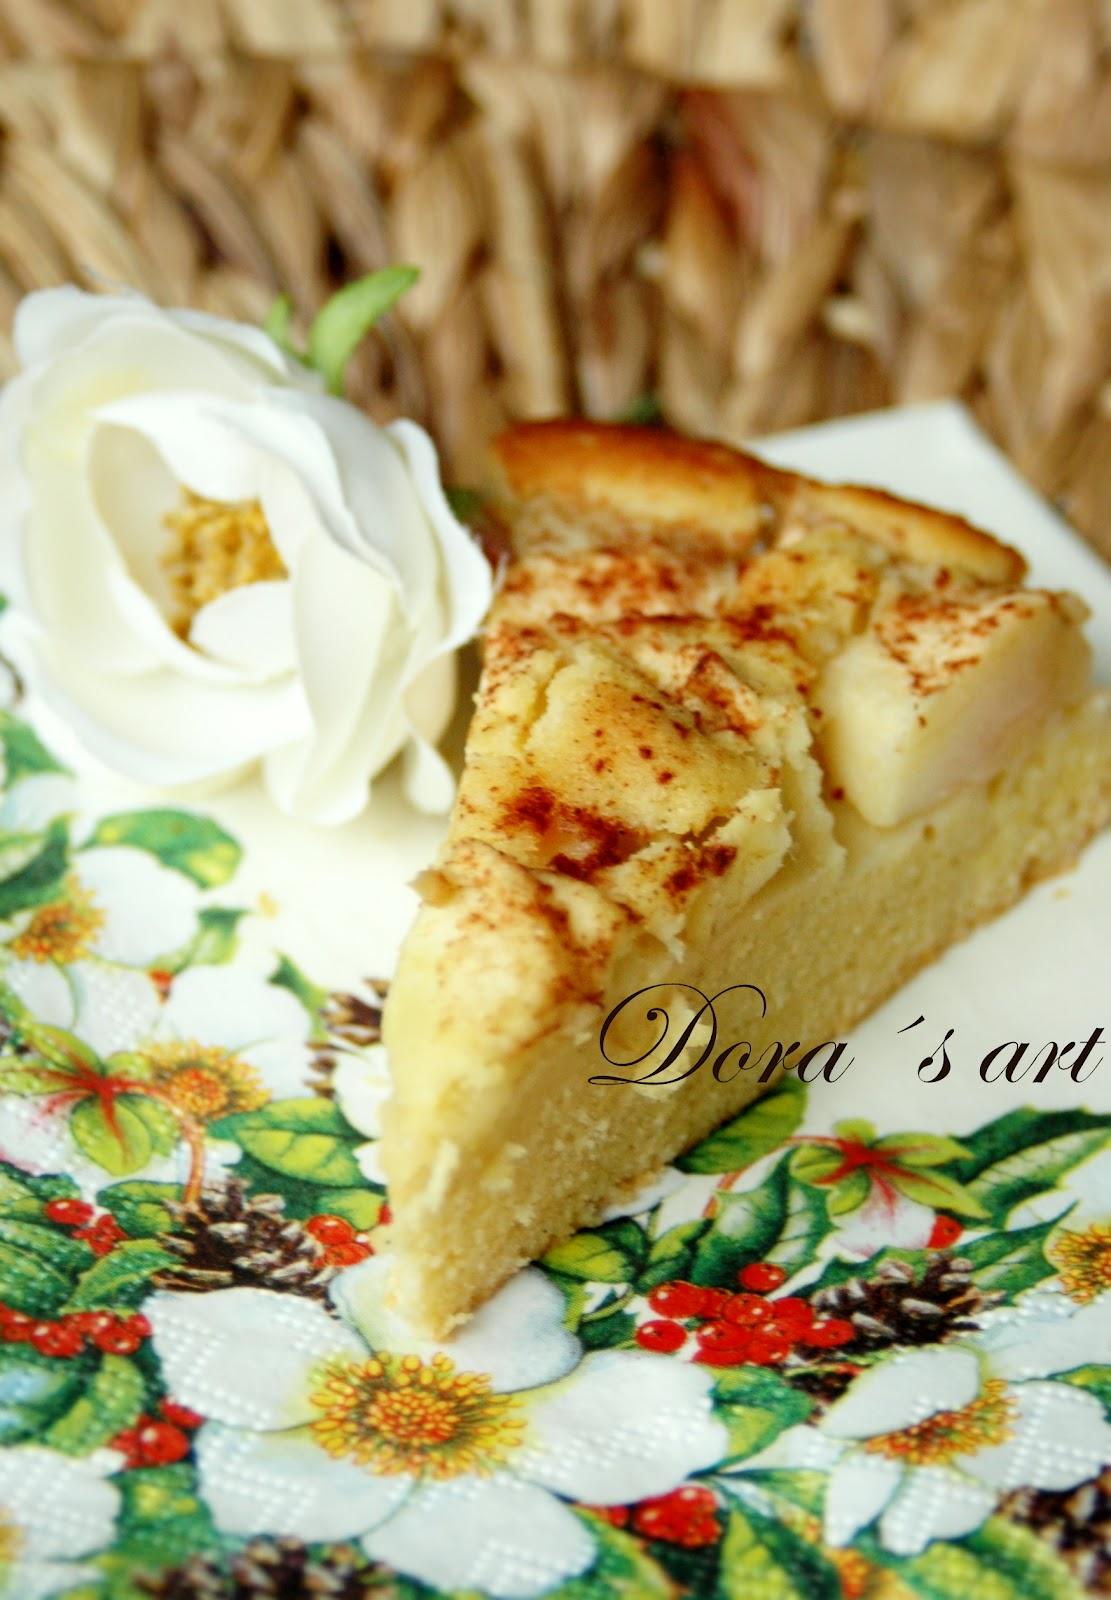 http://4.bp.blogspot.com/-14mvP7j-kBk/T0_oX_OJWTI/AAAAAAAAA7w/ZYfxRHfFgQE/s1600/Torta+di+mele+2D.jpg